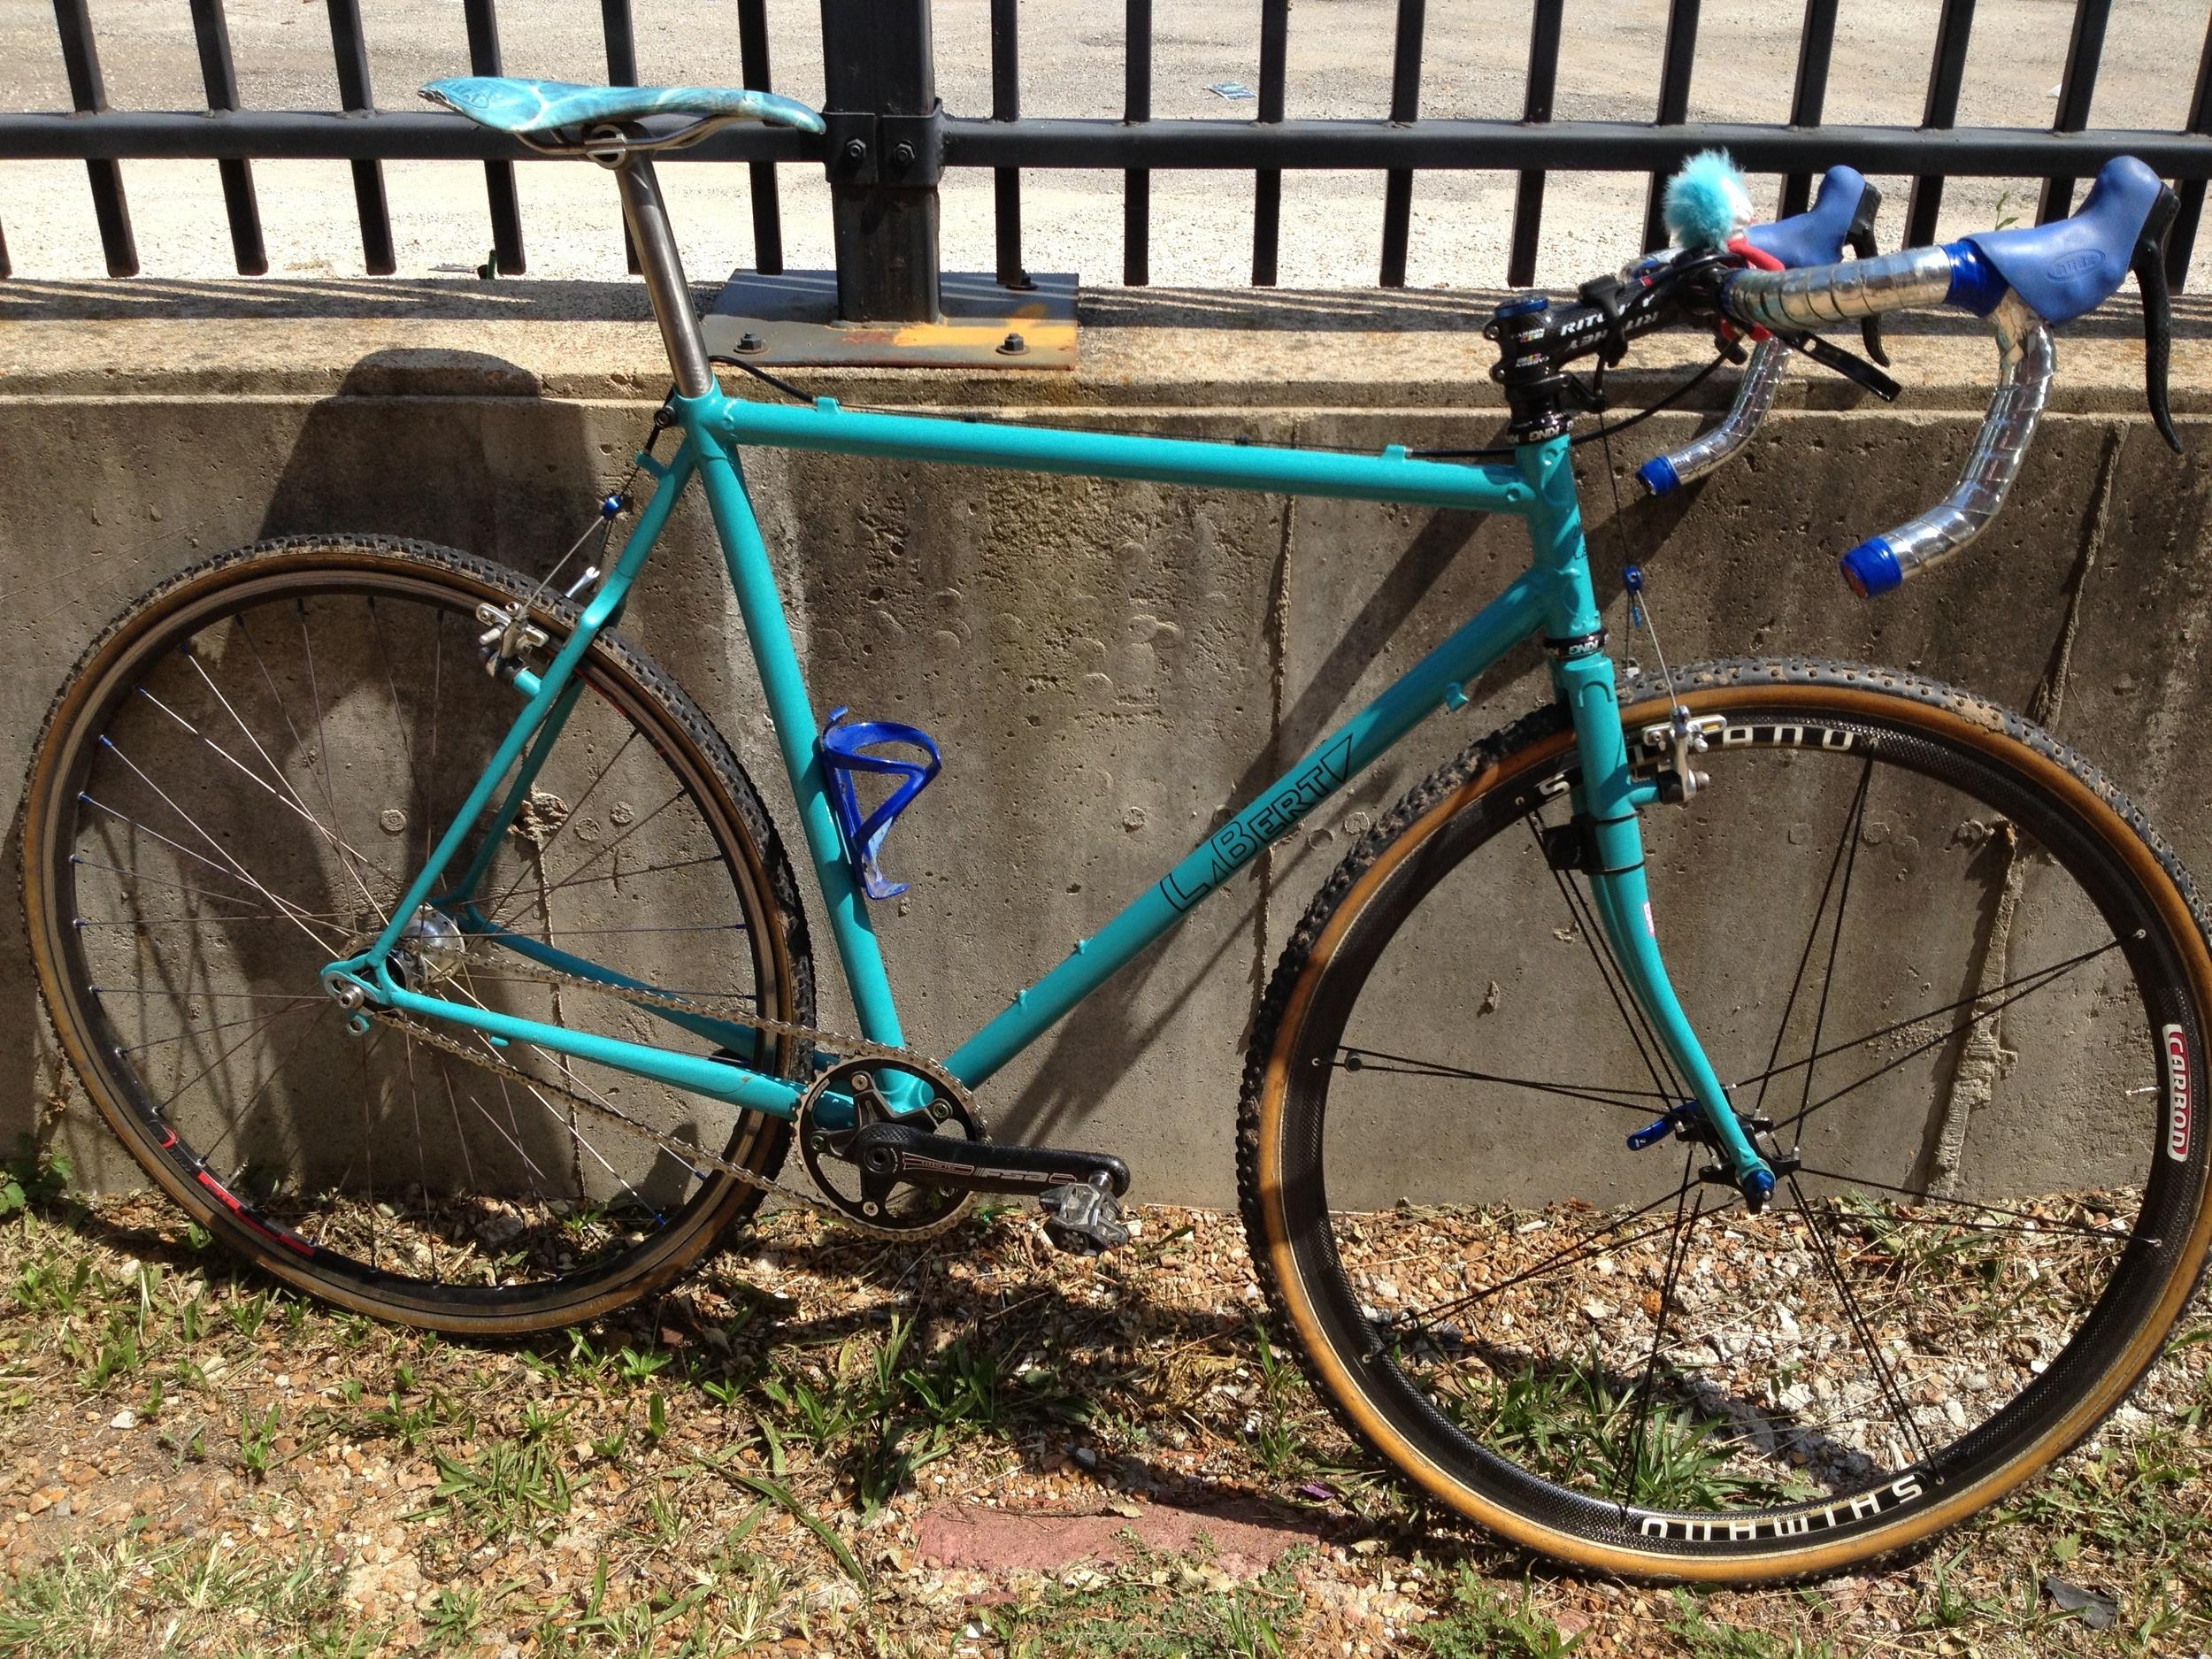 LaBerta custom steel bike teal